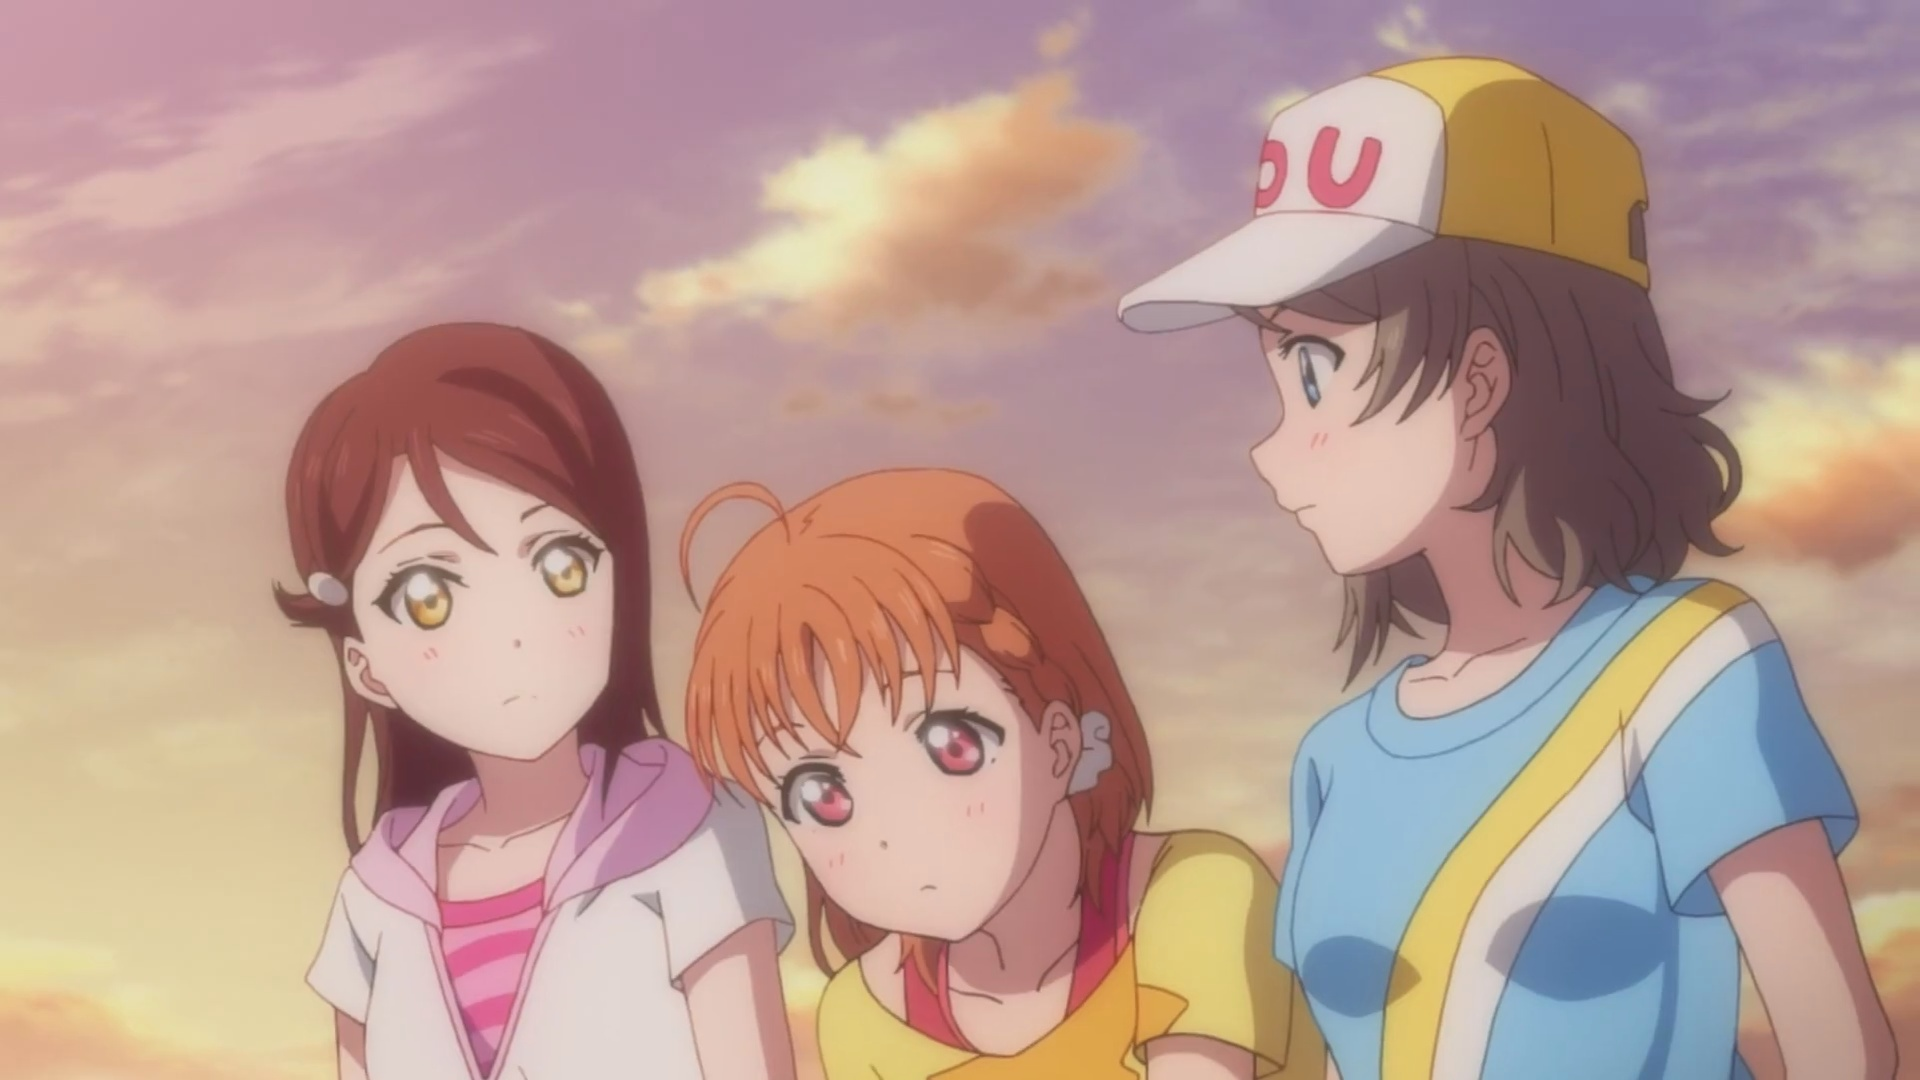 Anime Wave Sound 3